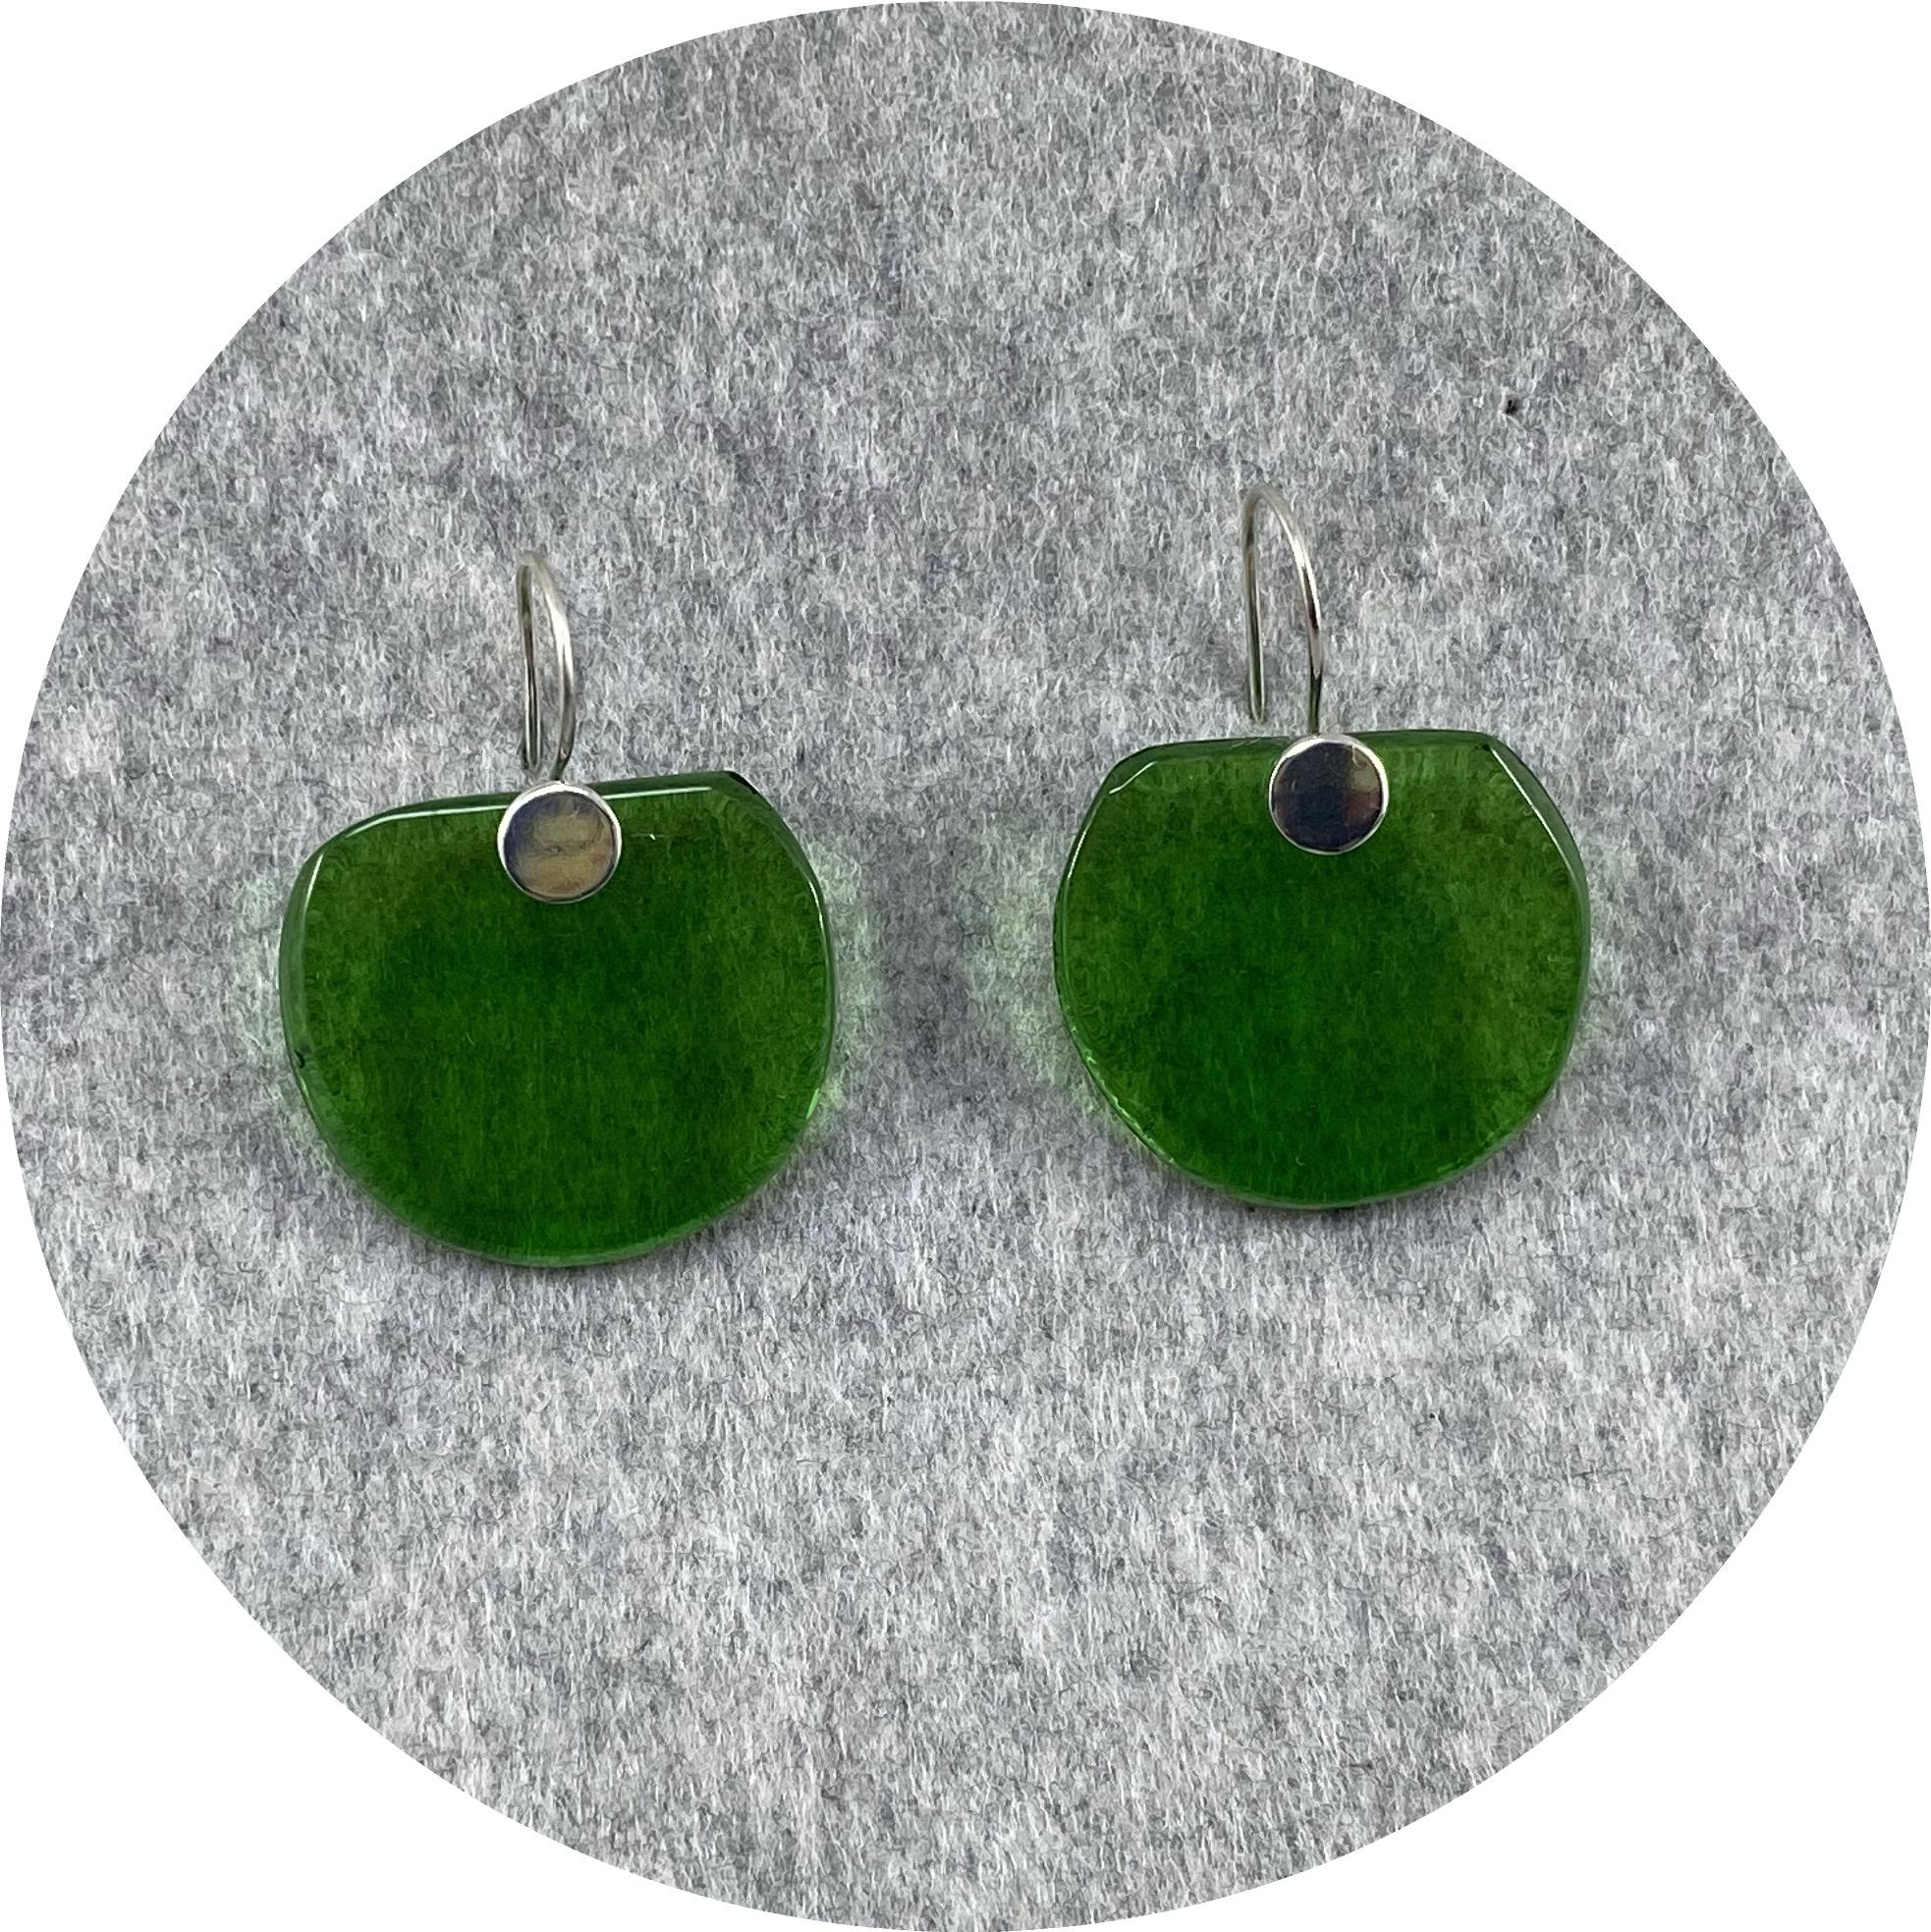 Alight Glass - Bottle Green Half Circle Earrings, Glass, Sterling Silver